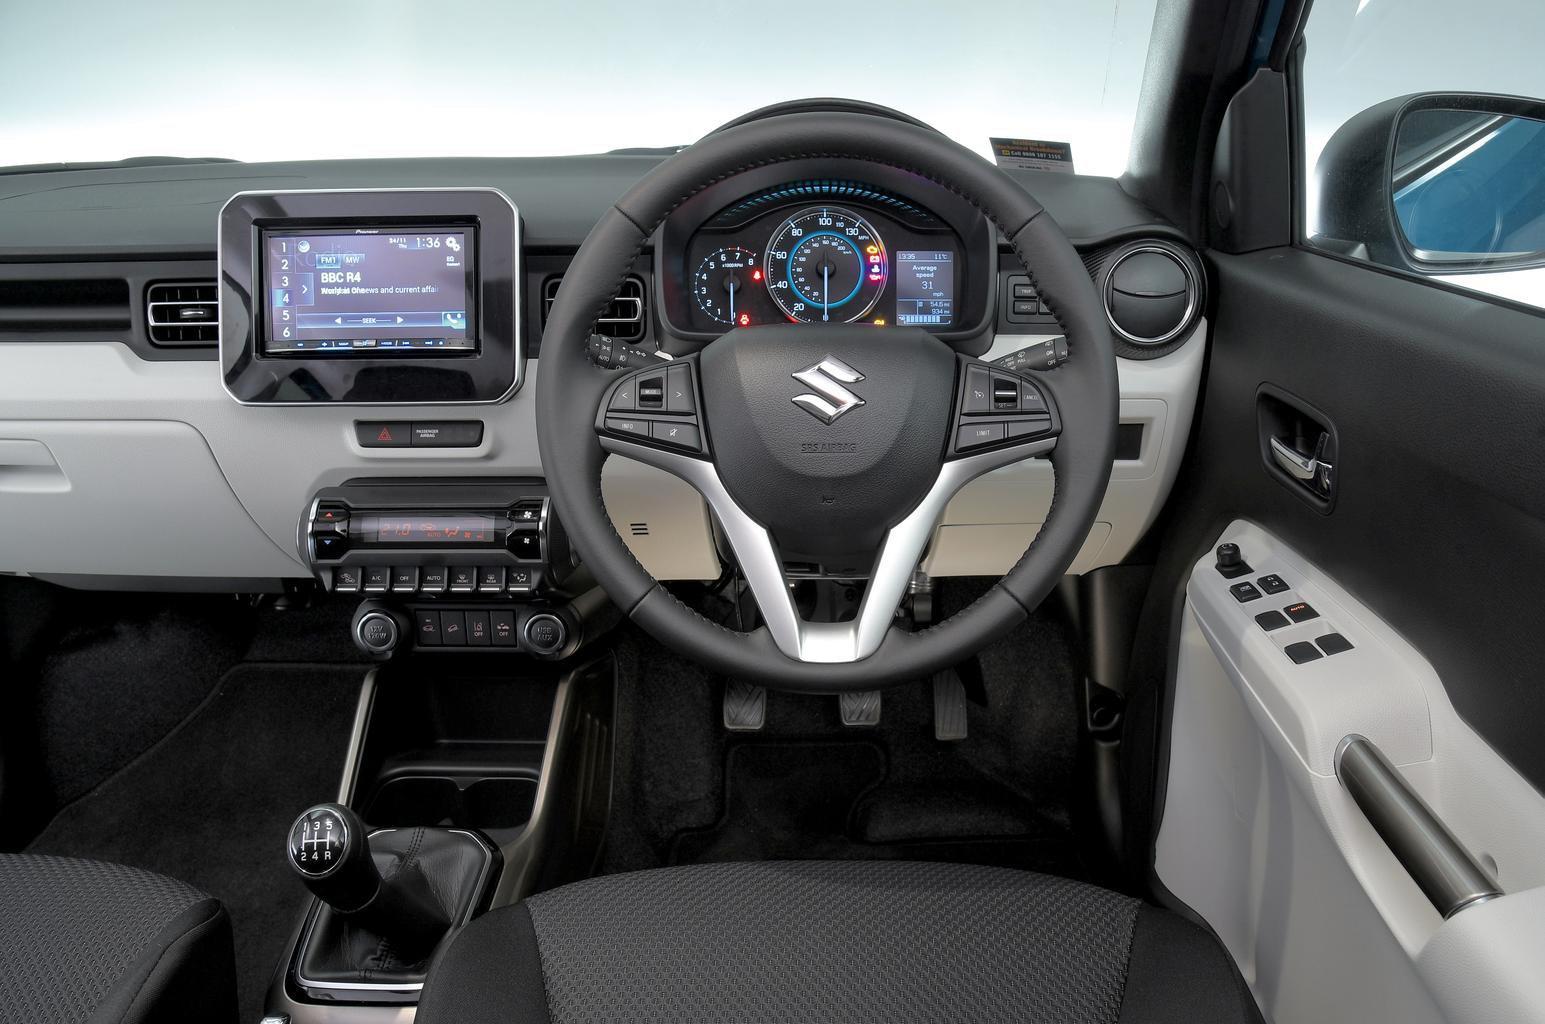 Suzuki Ignis 1.2 Dualjet SZ3 - interior